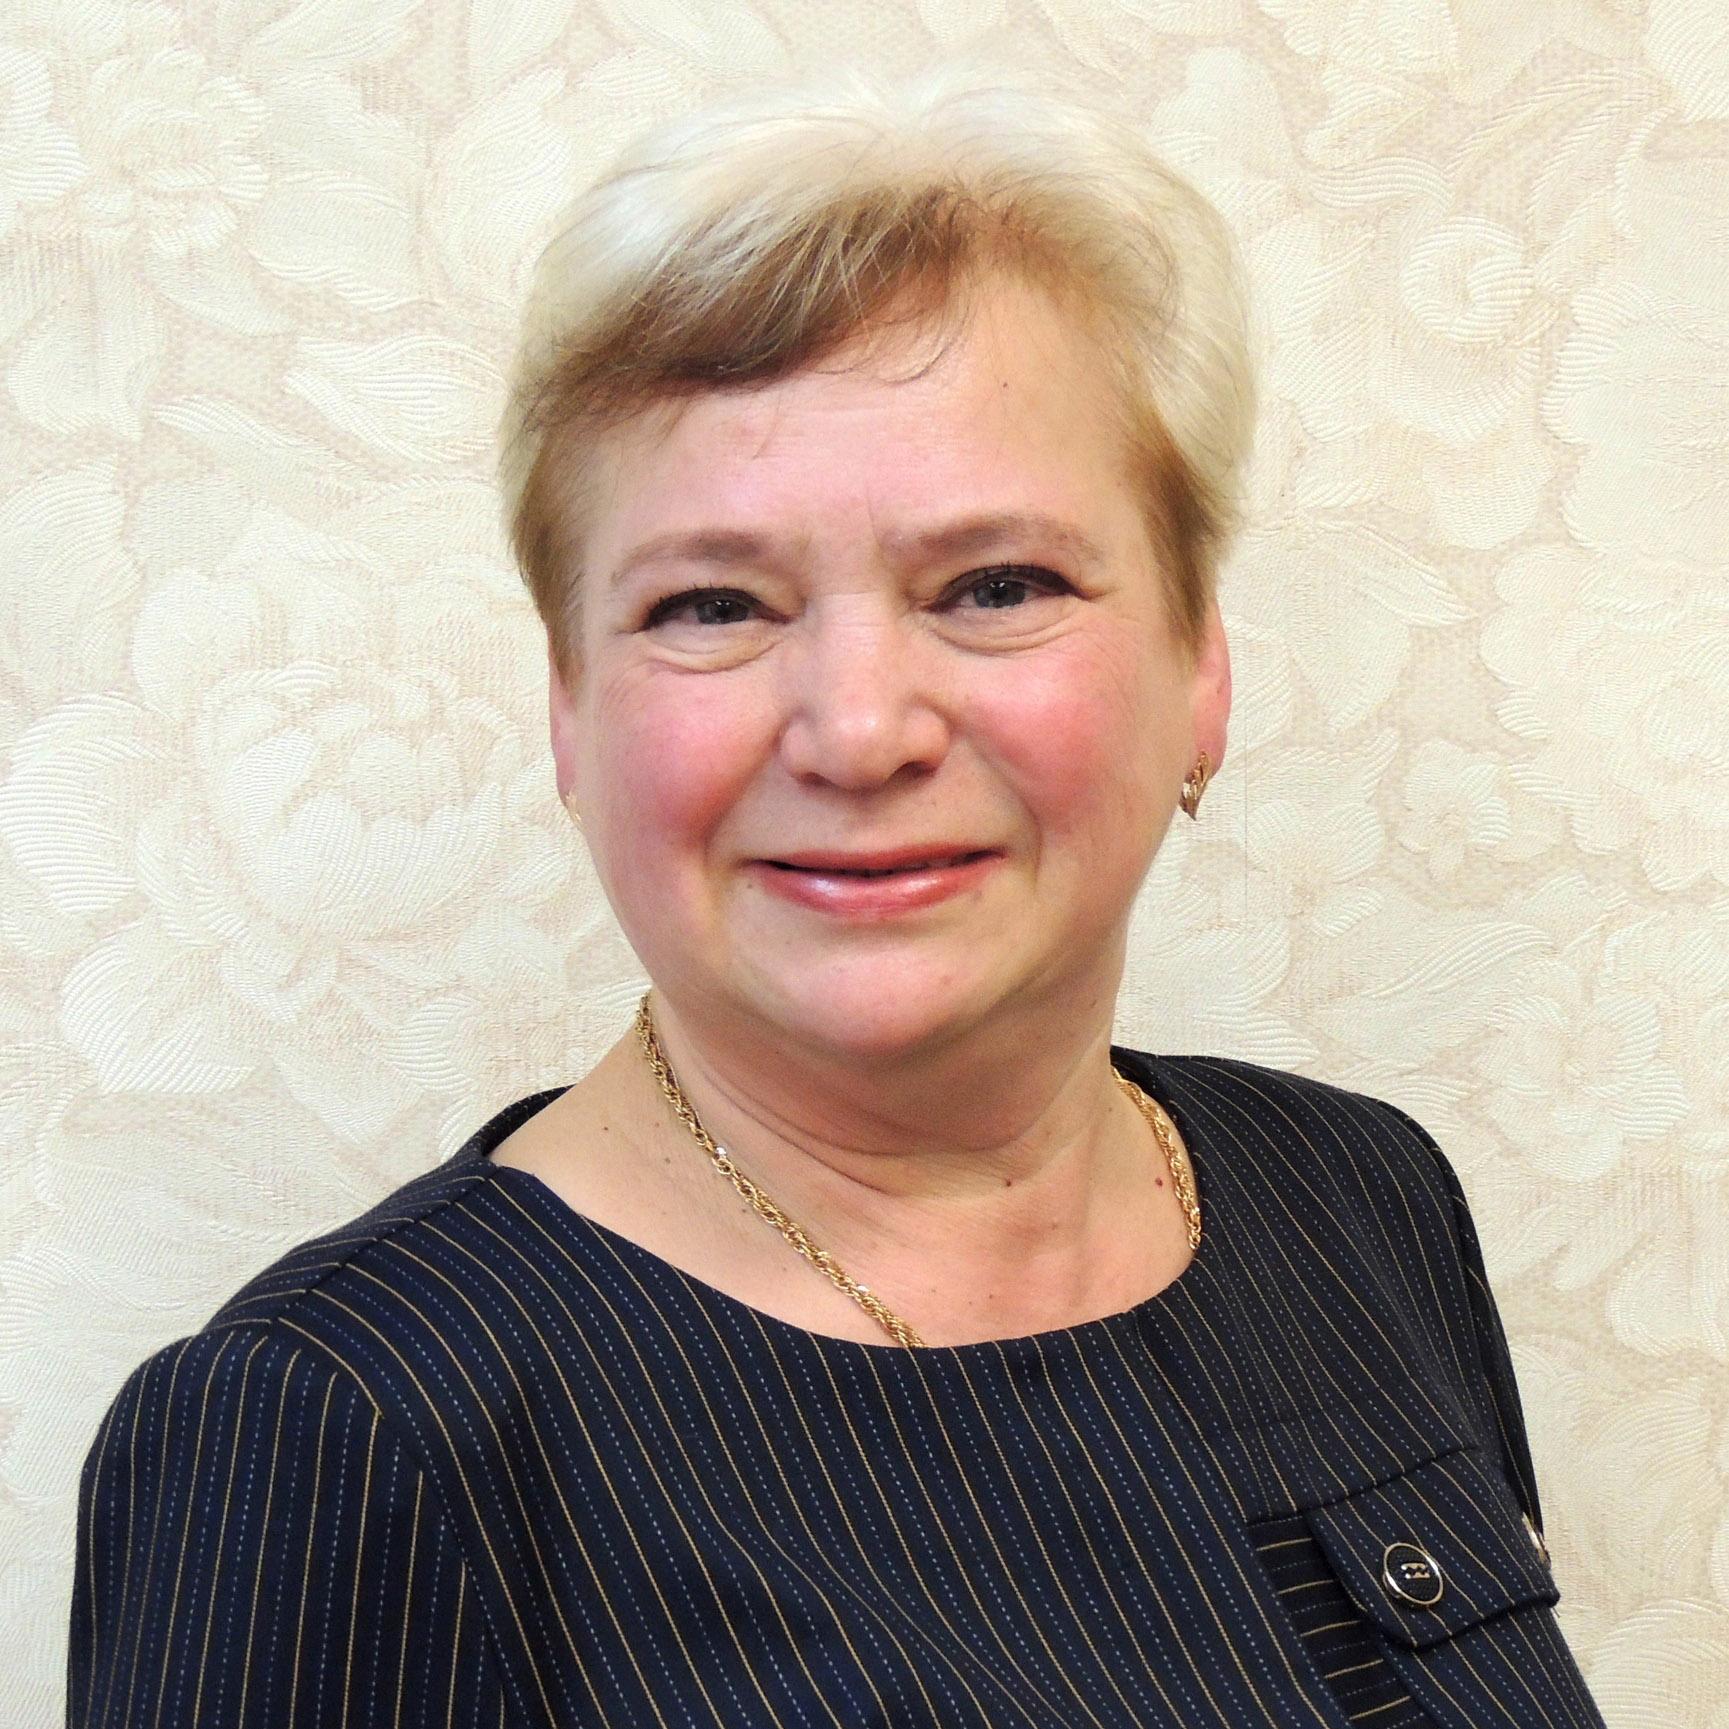 Богатырева Анна Борисовна